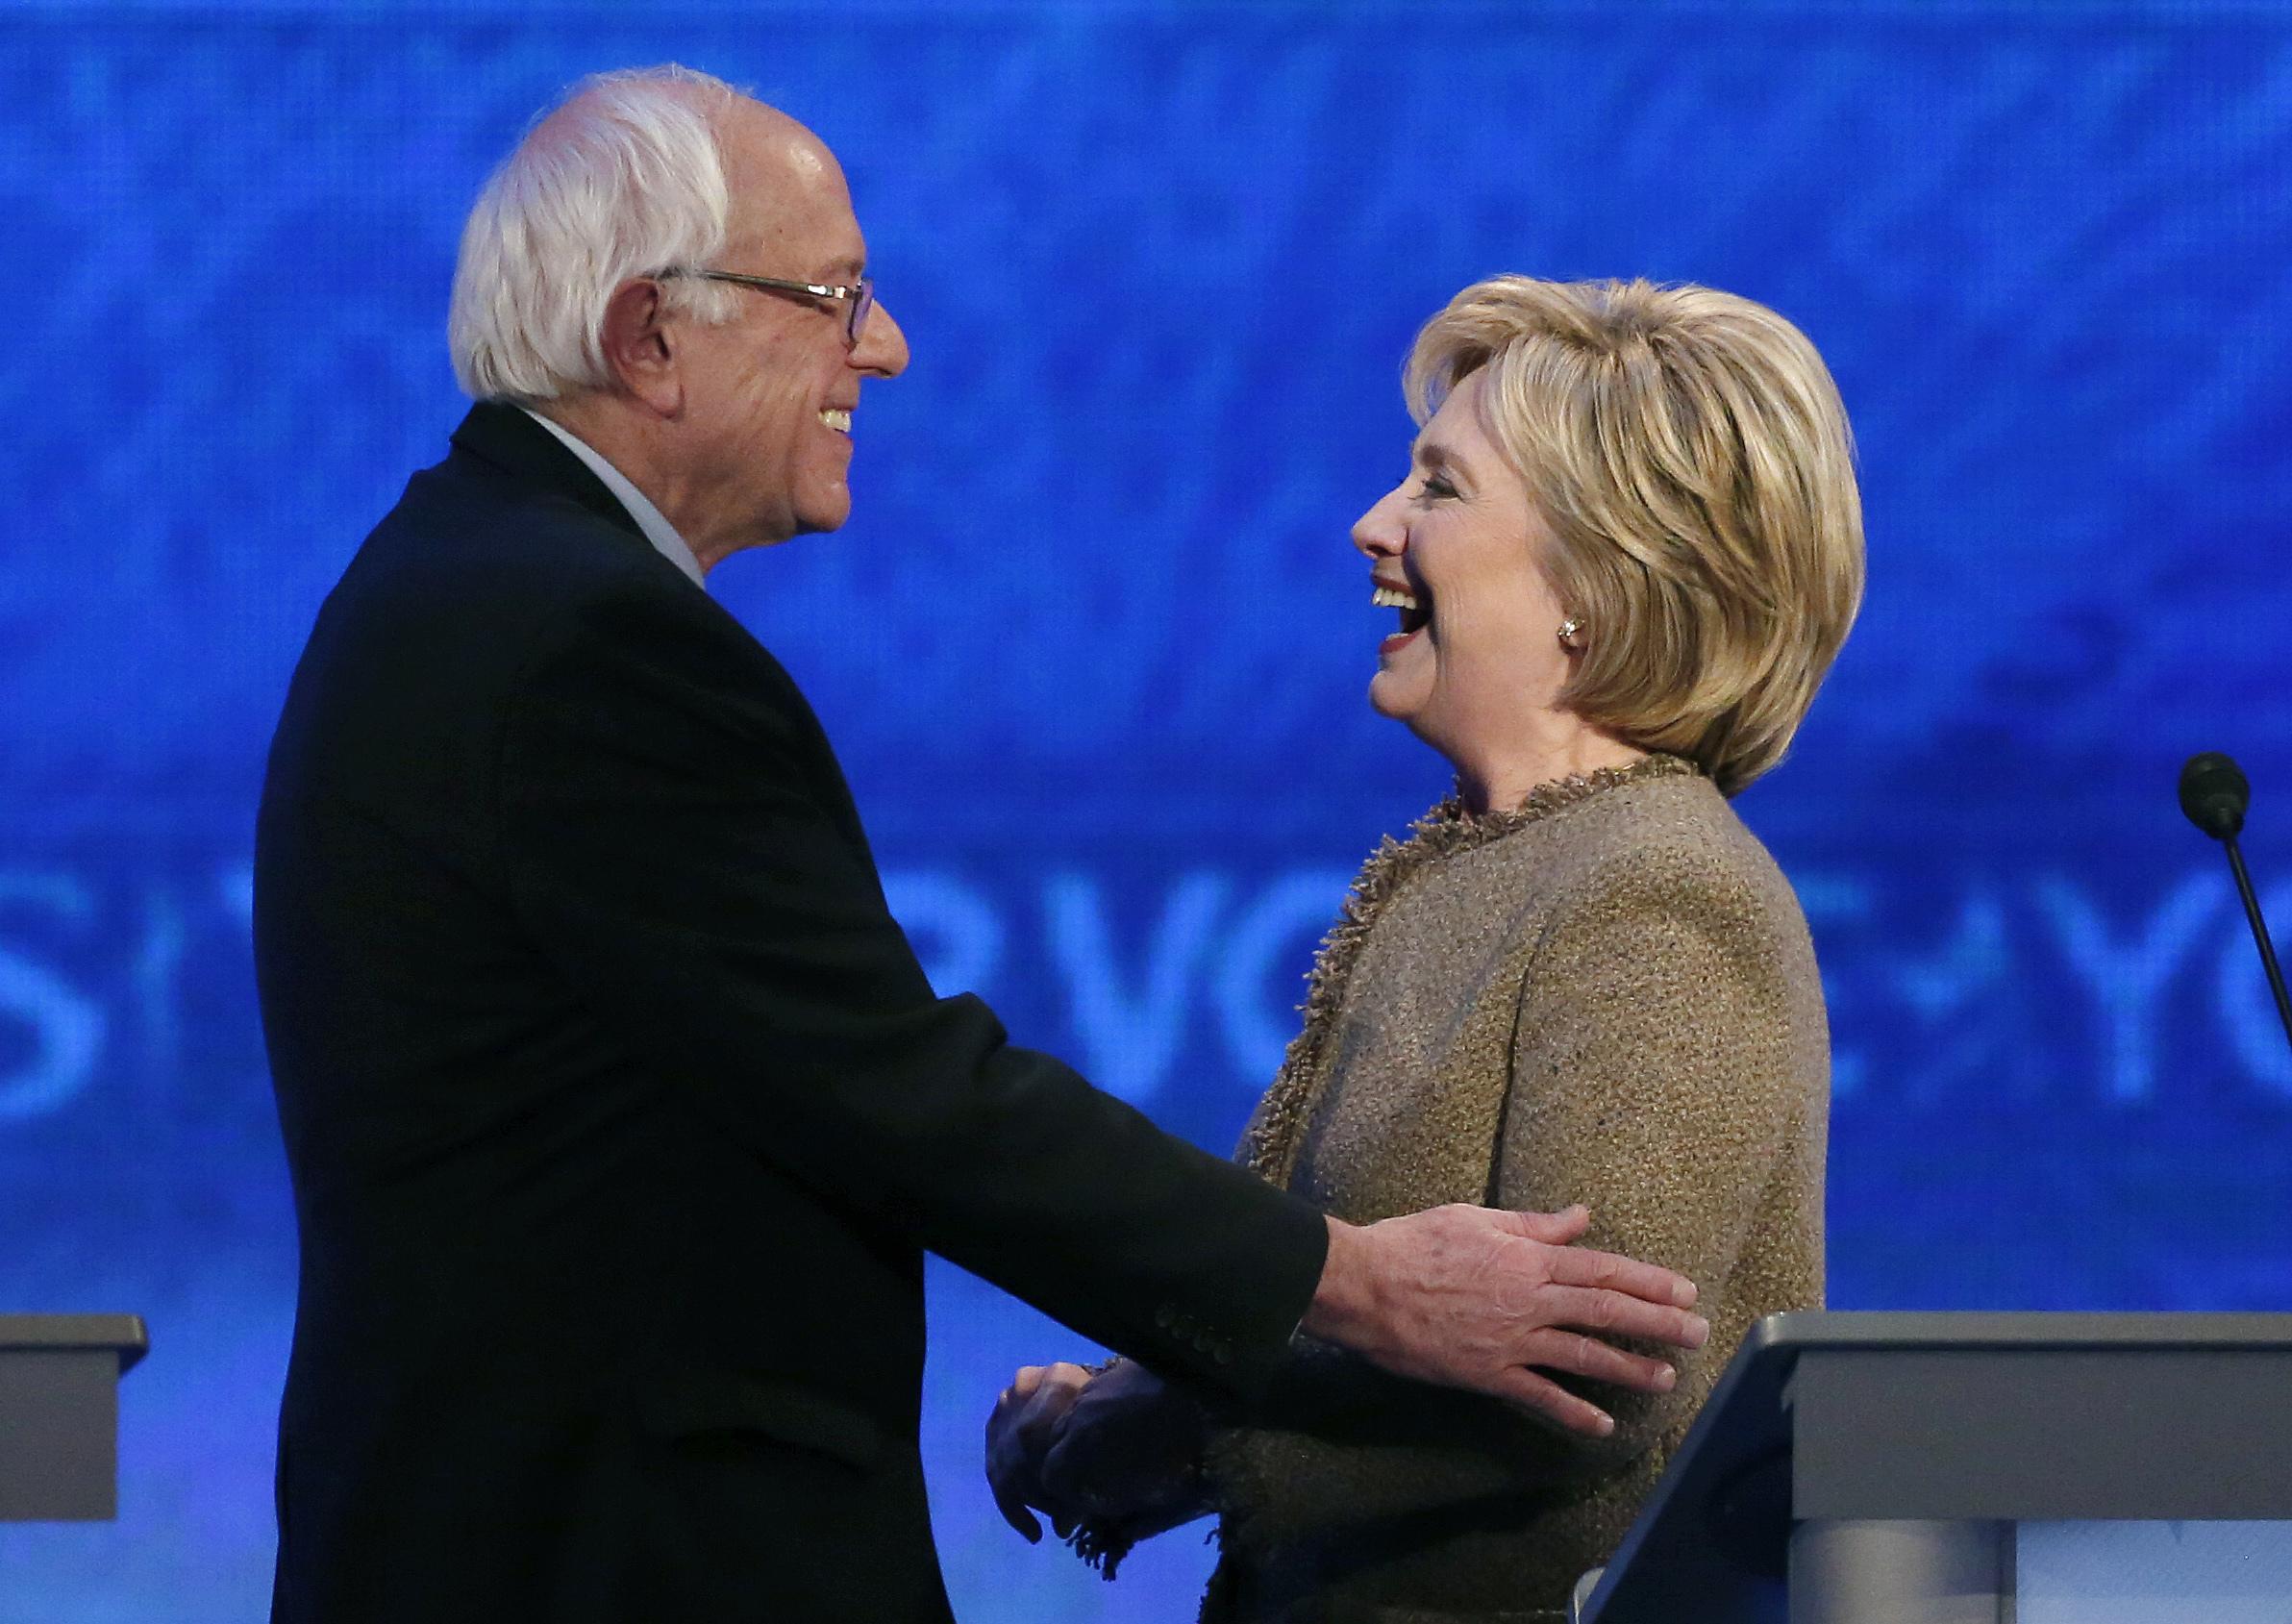 US Democratic debate: Clinton makes 'Isis recruiter' jibe at Trump